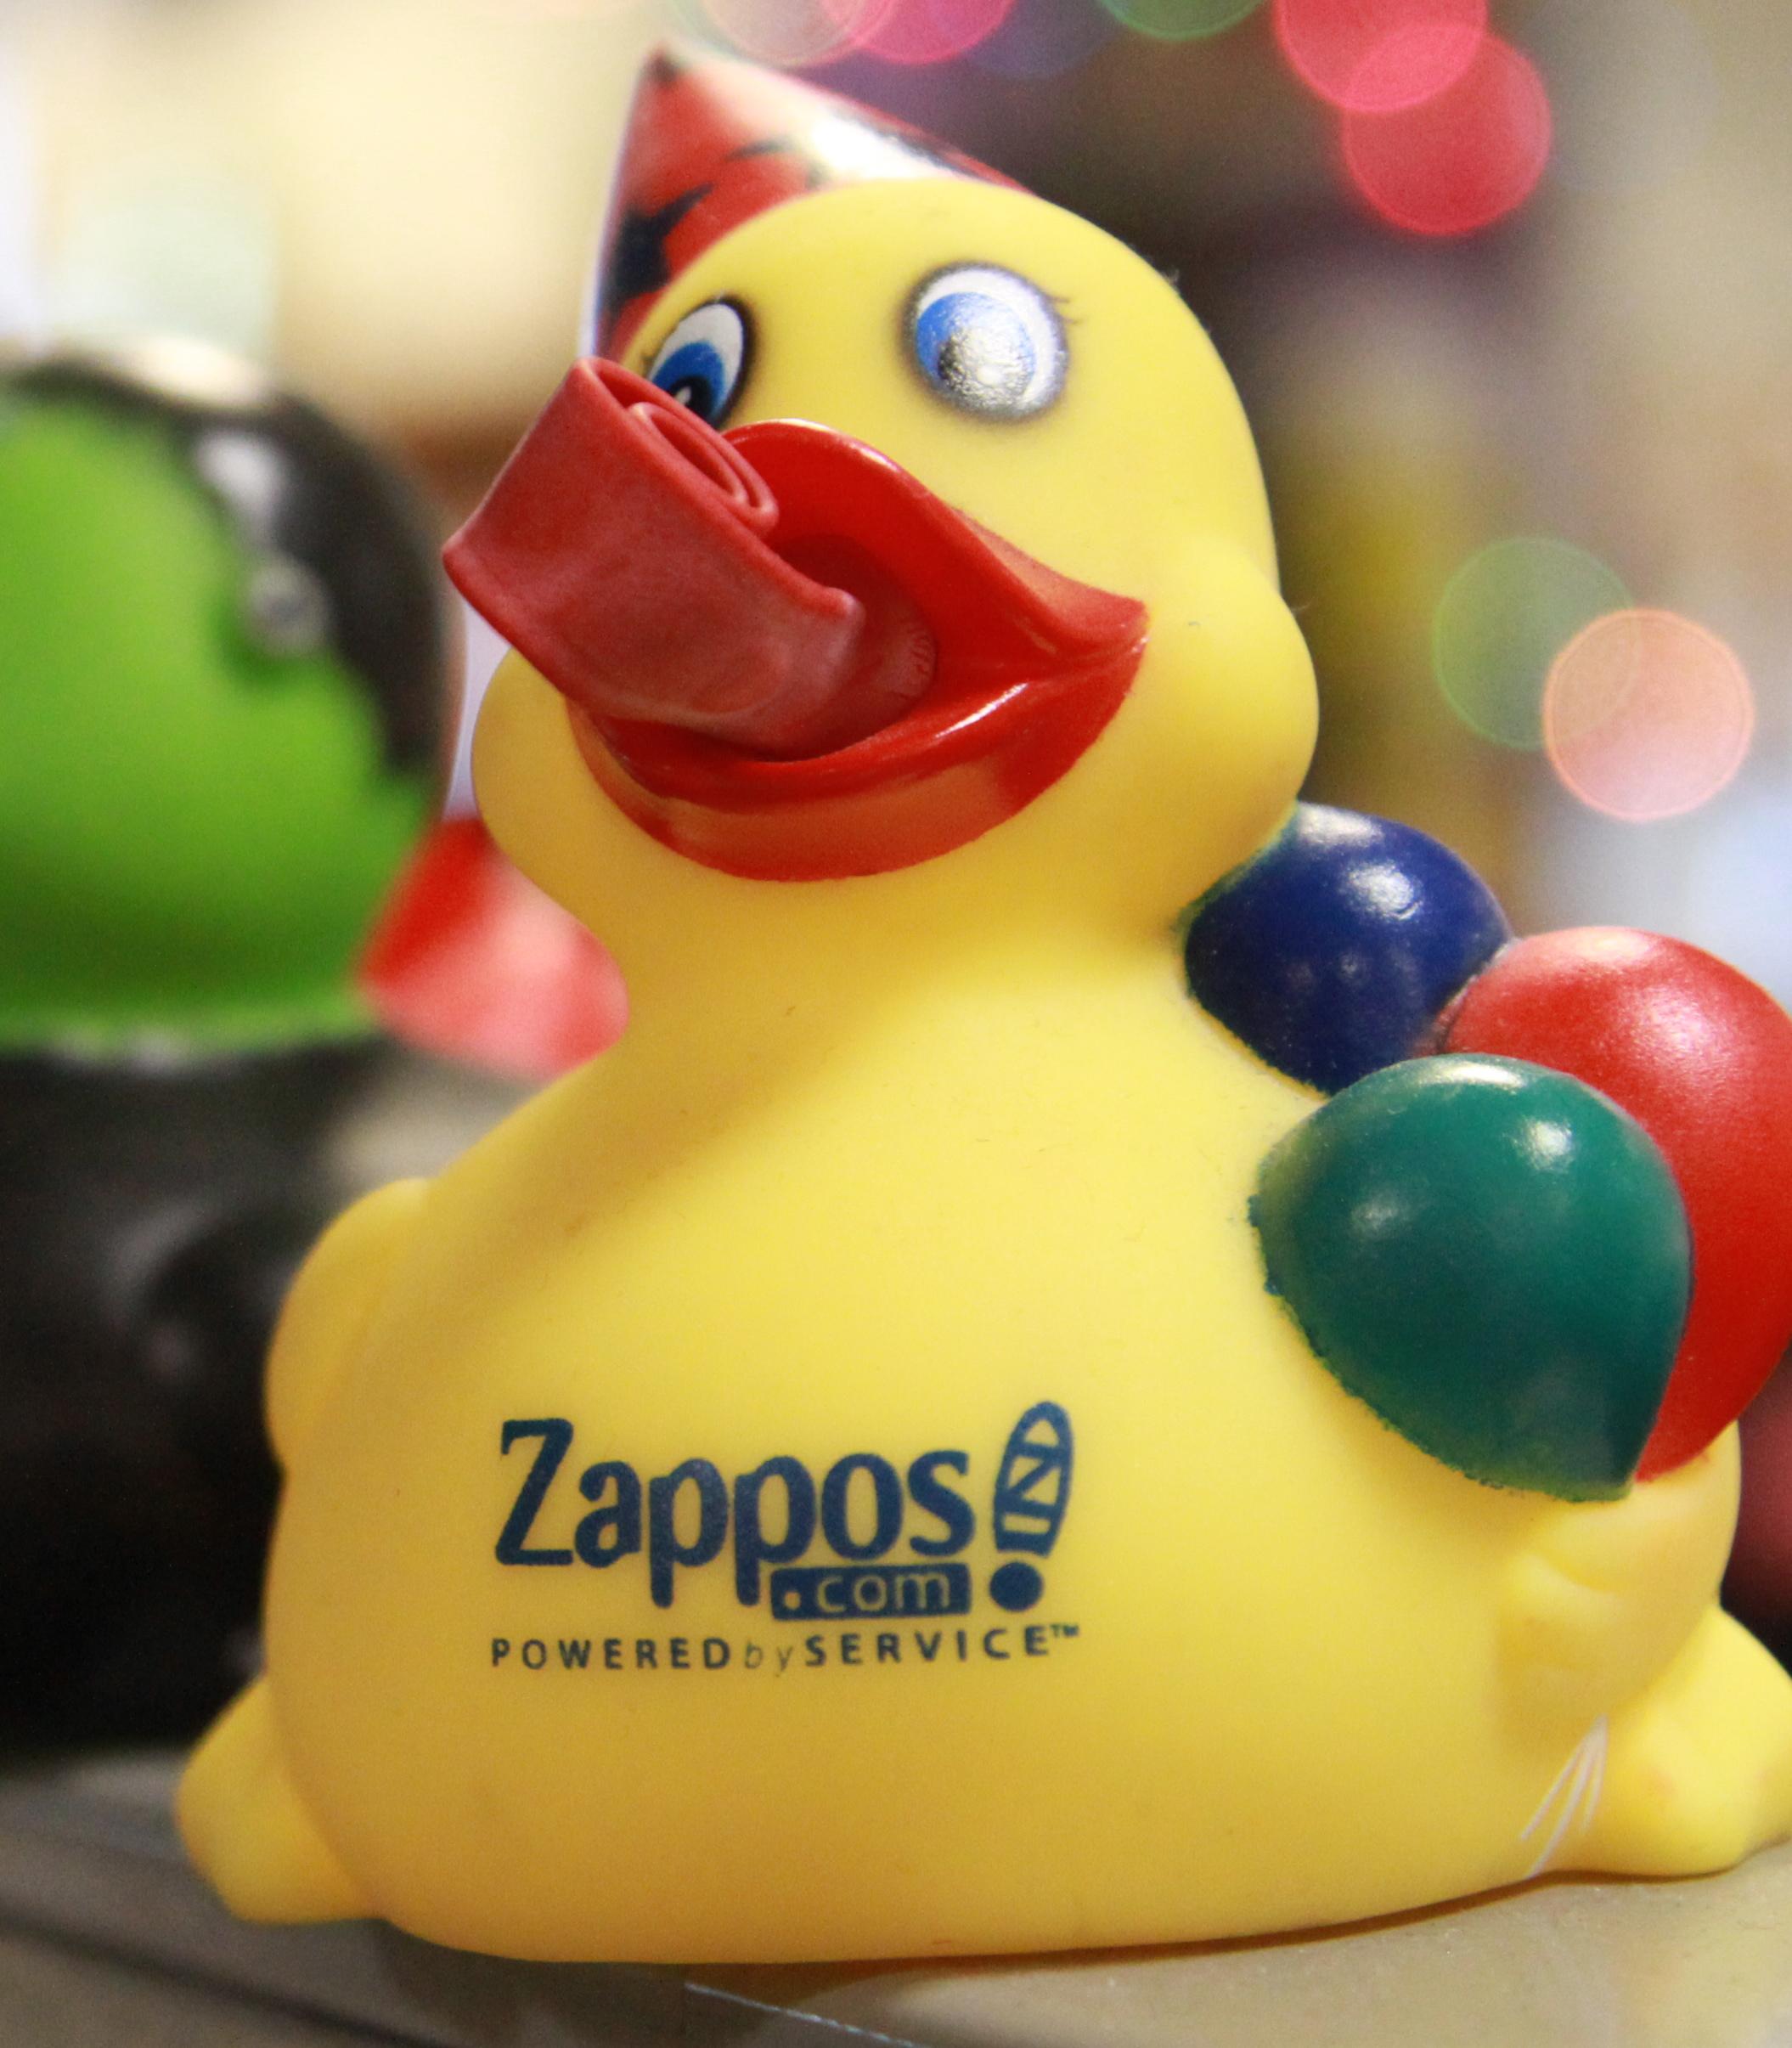 Zappos customer service